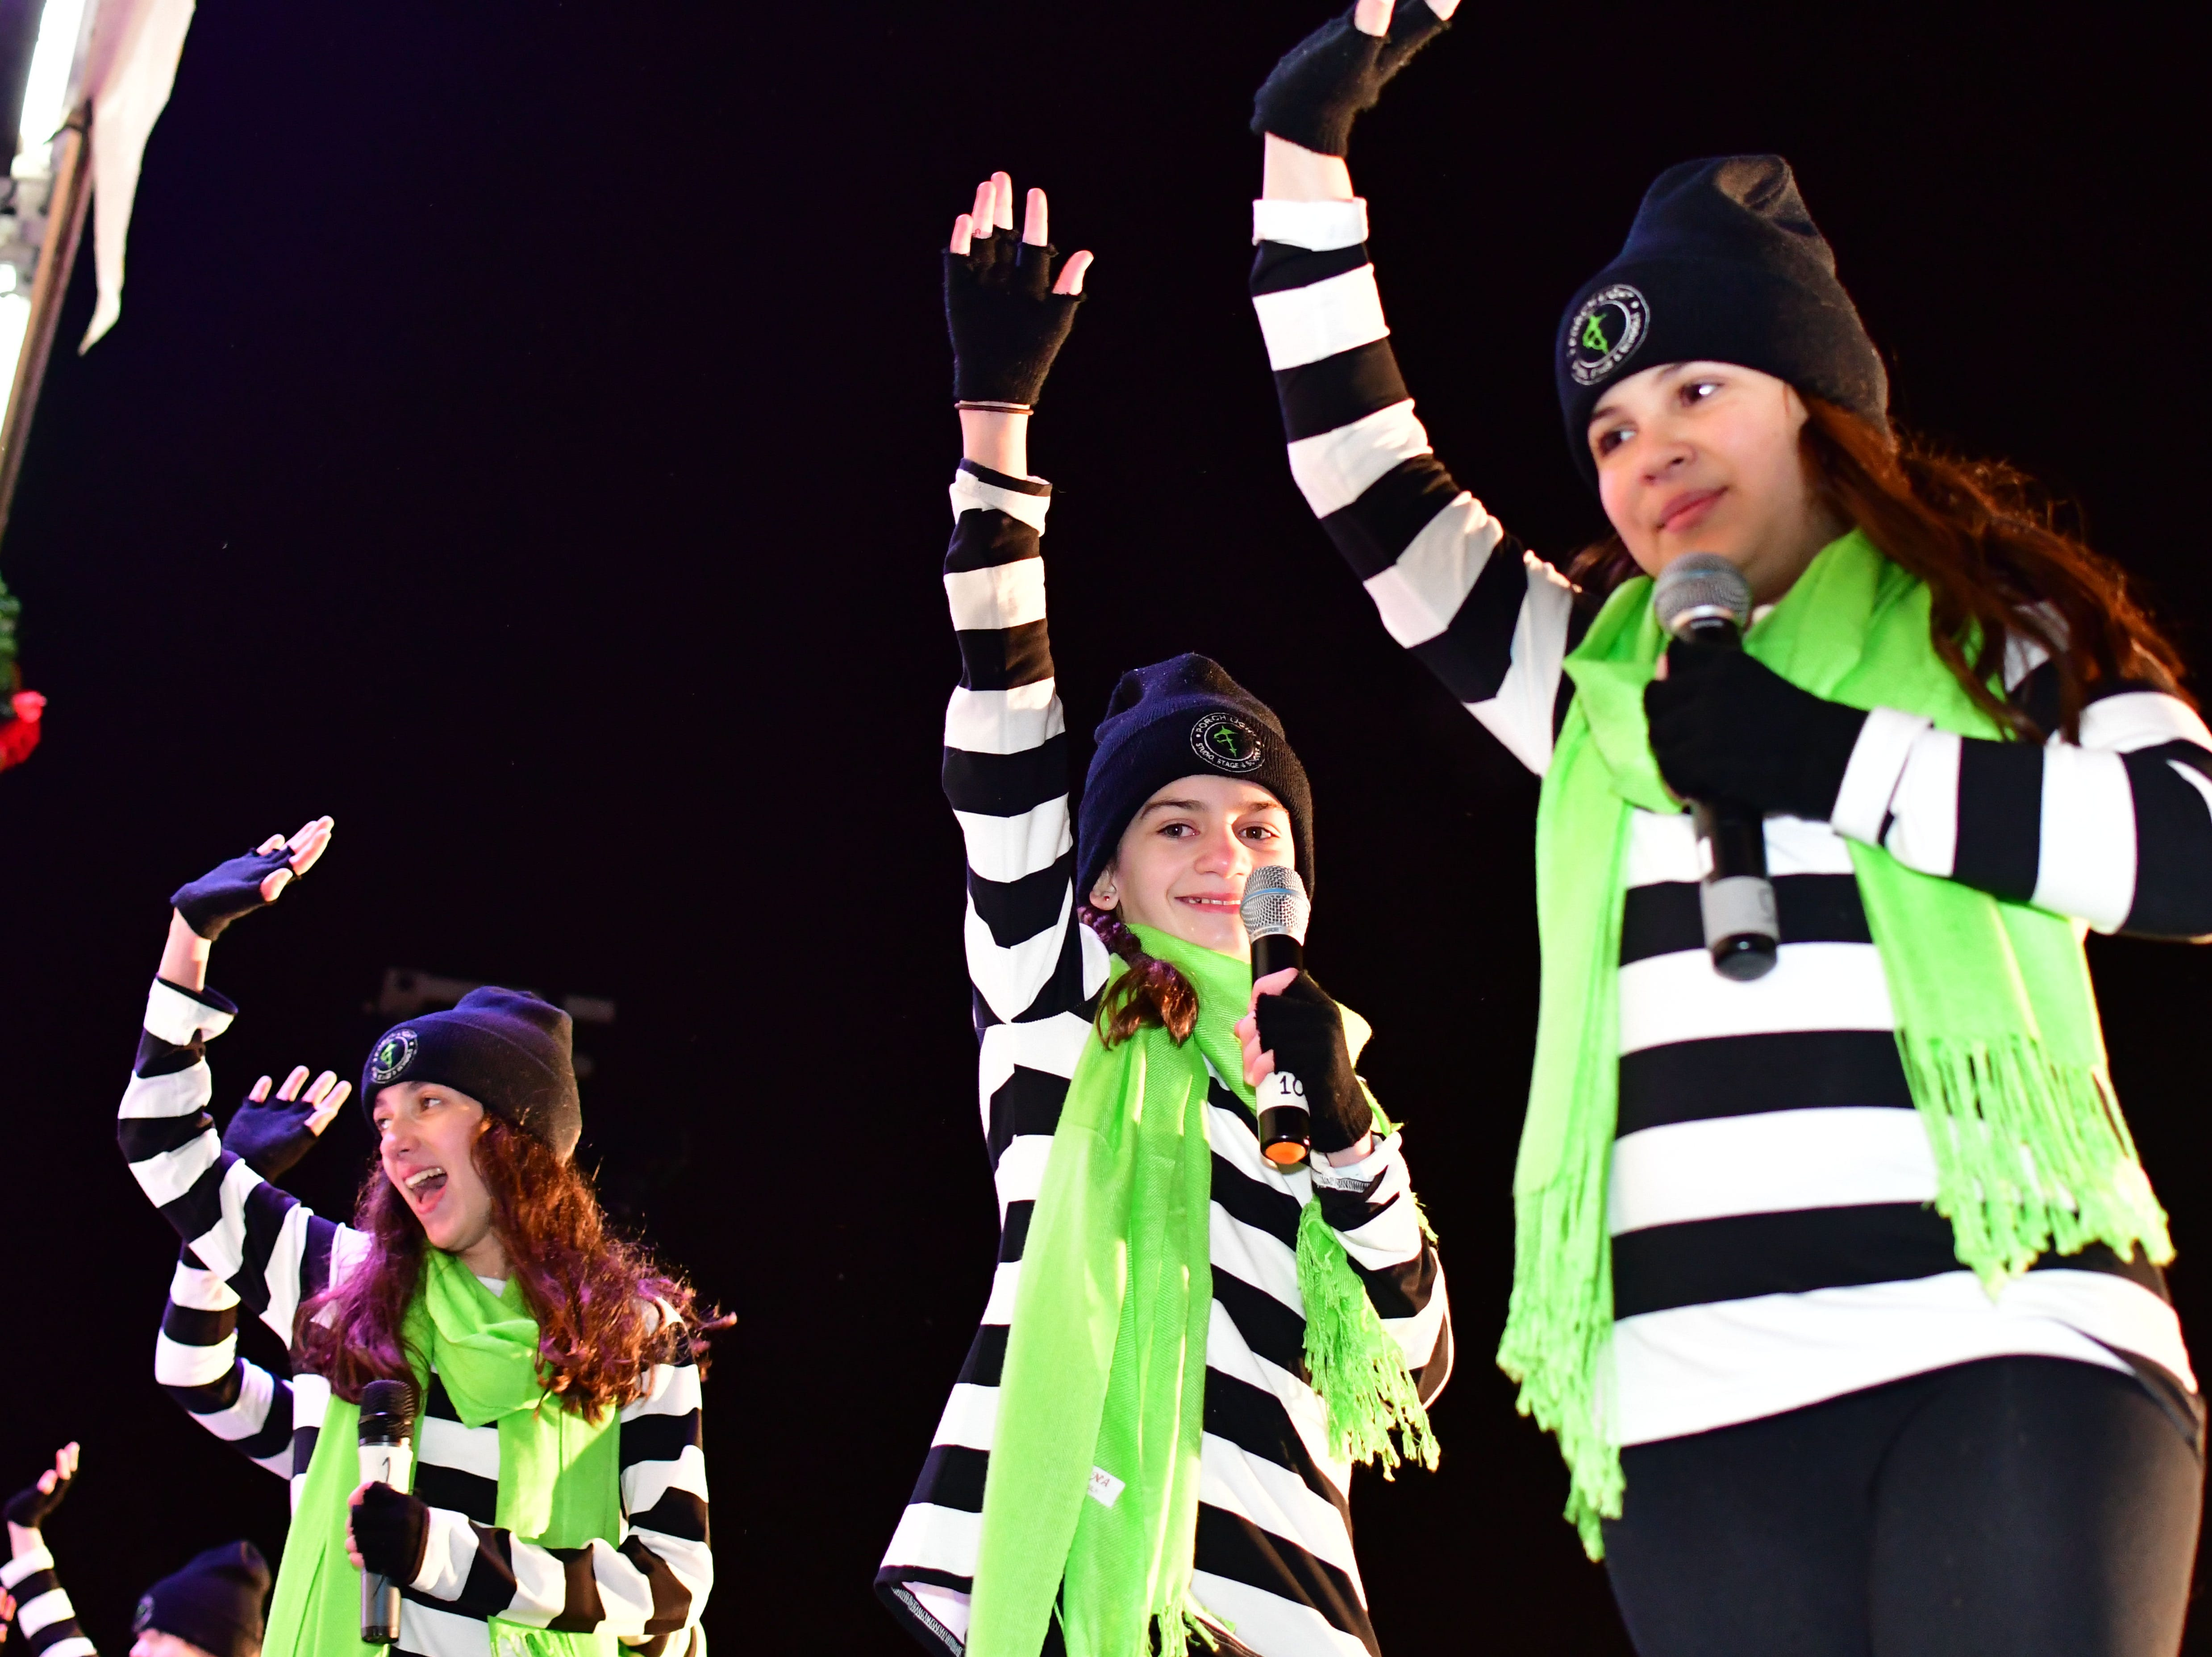 Stage performers. Holiday festivities along East Ridgewood Avenue in Ridgewood on Nov. 30.